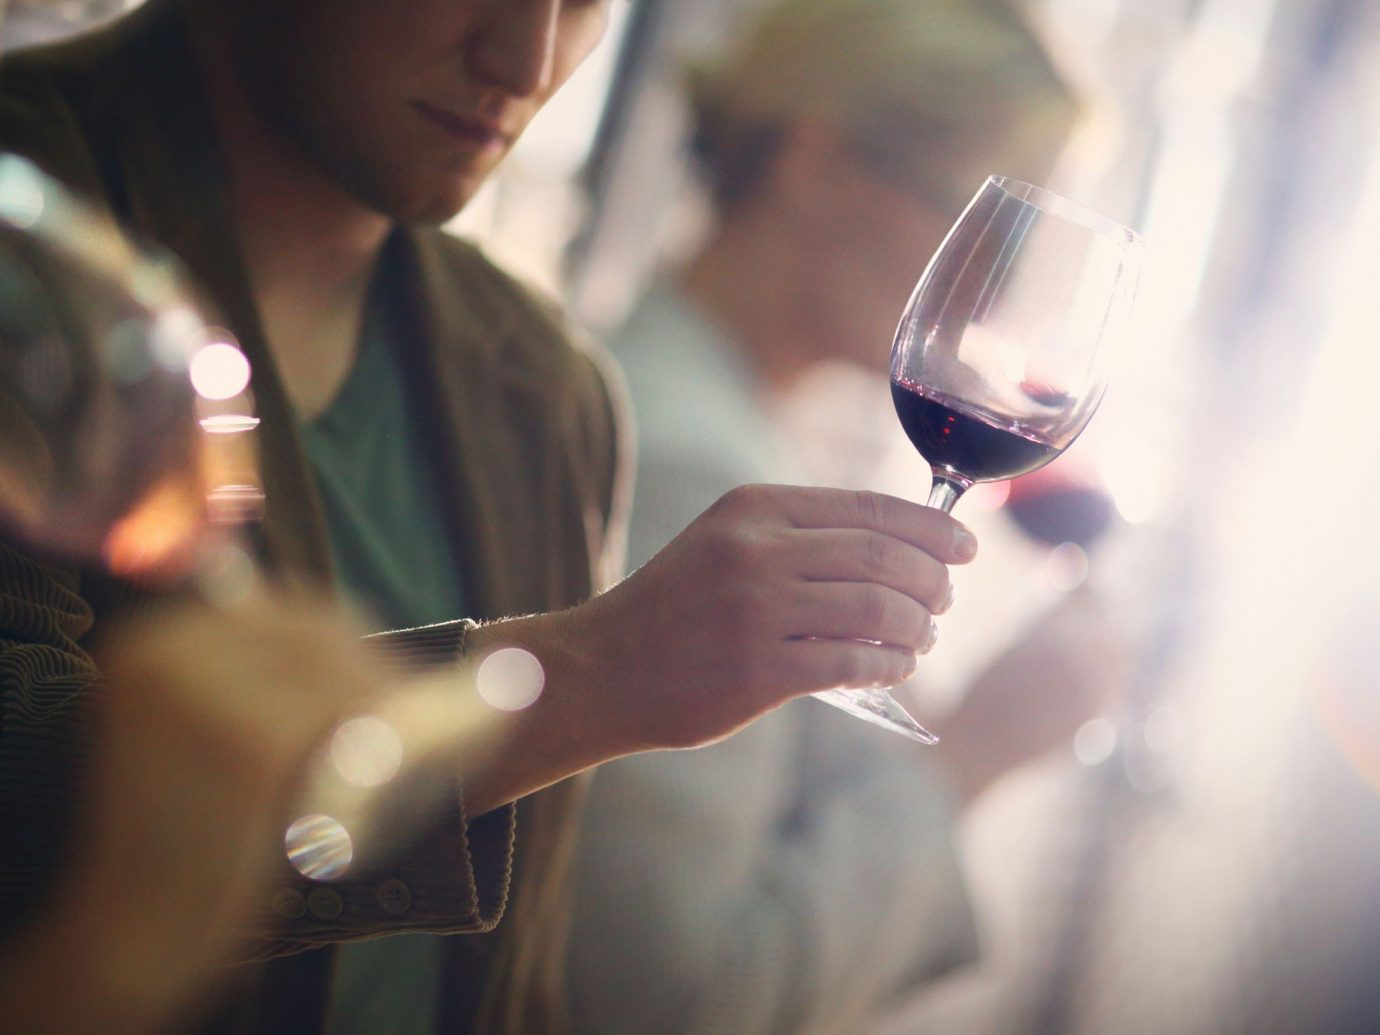 Trip Ideas wine person glass glasses photograph indoor singing sense close